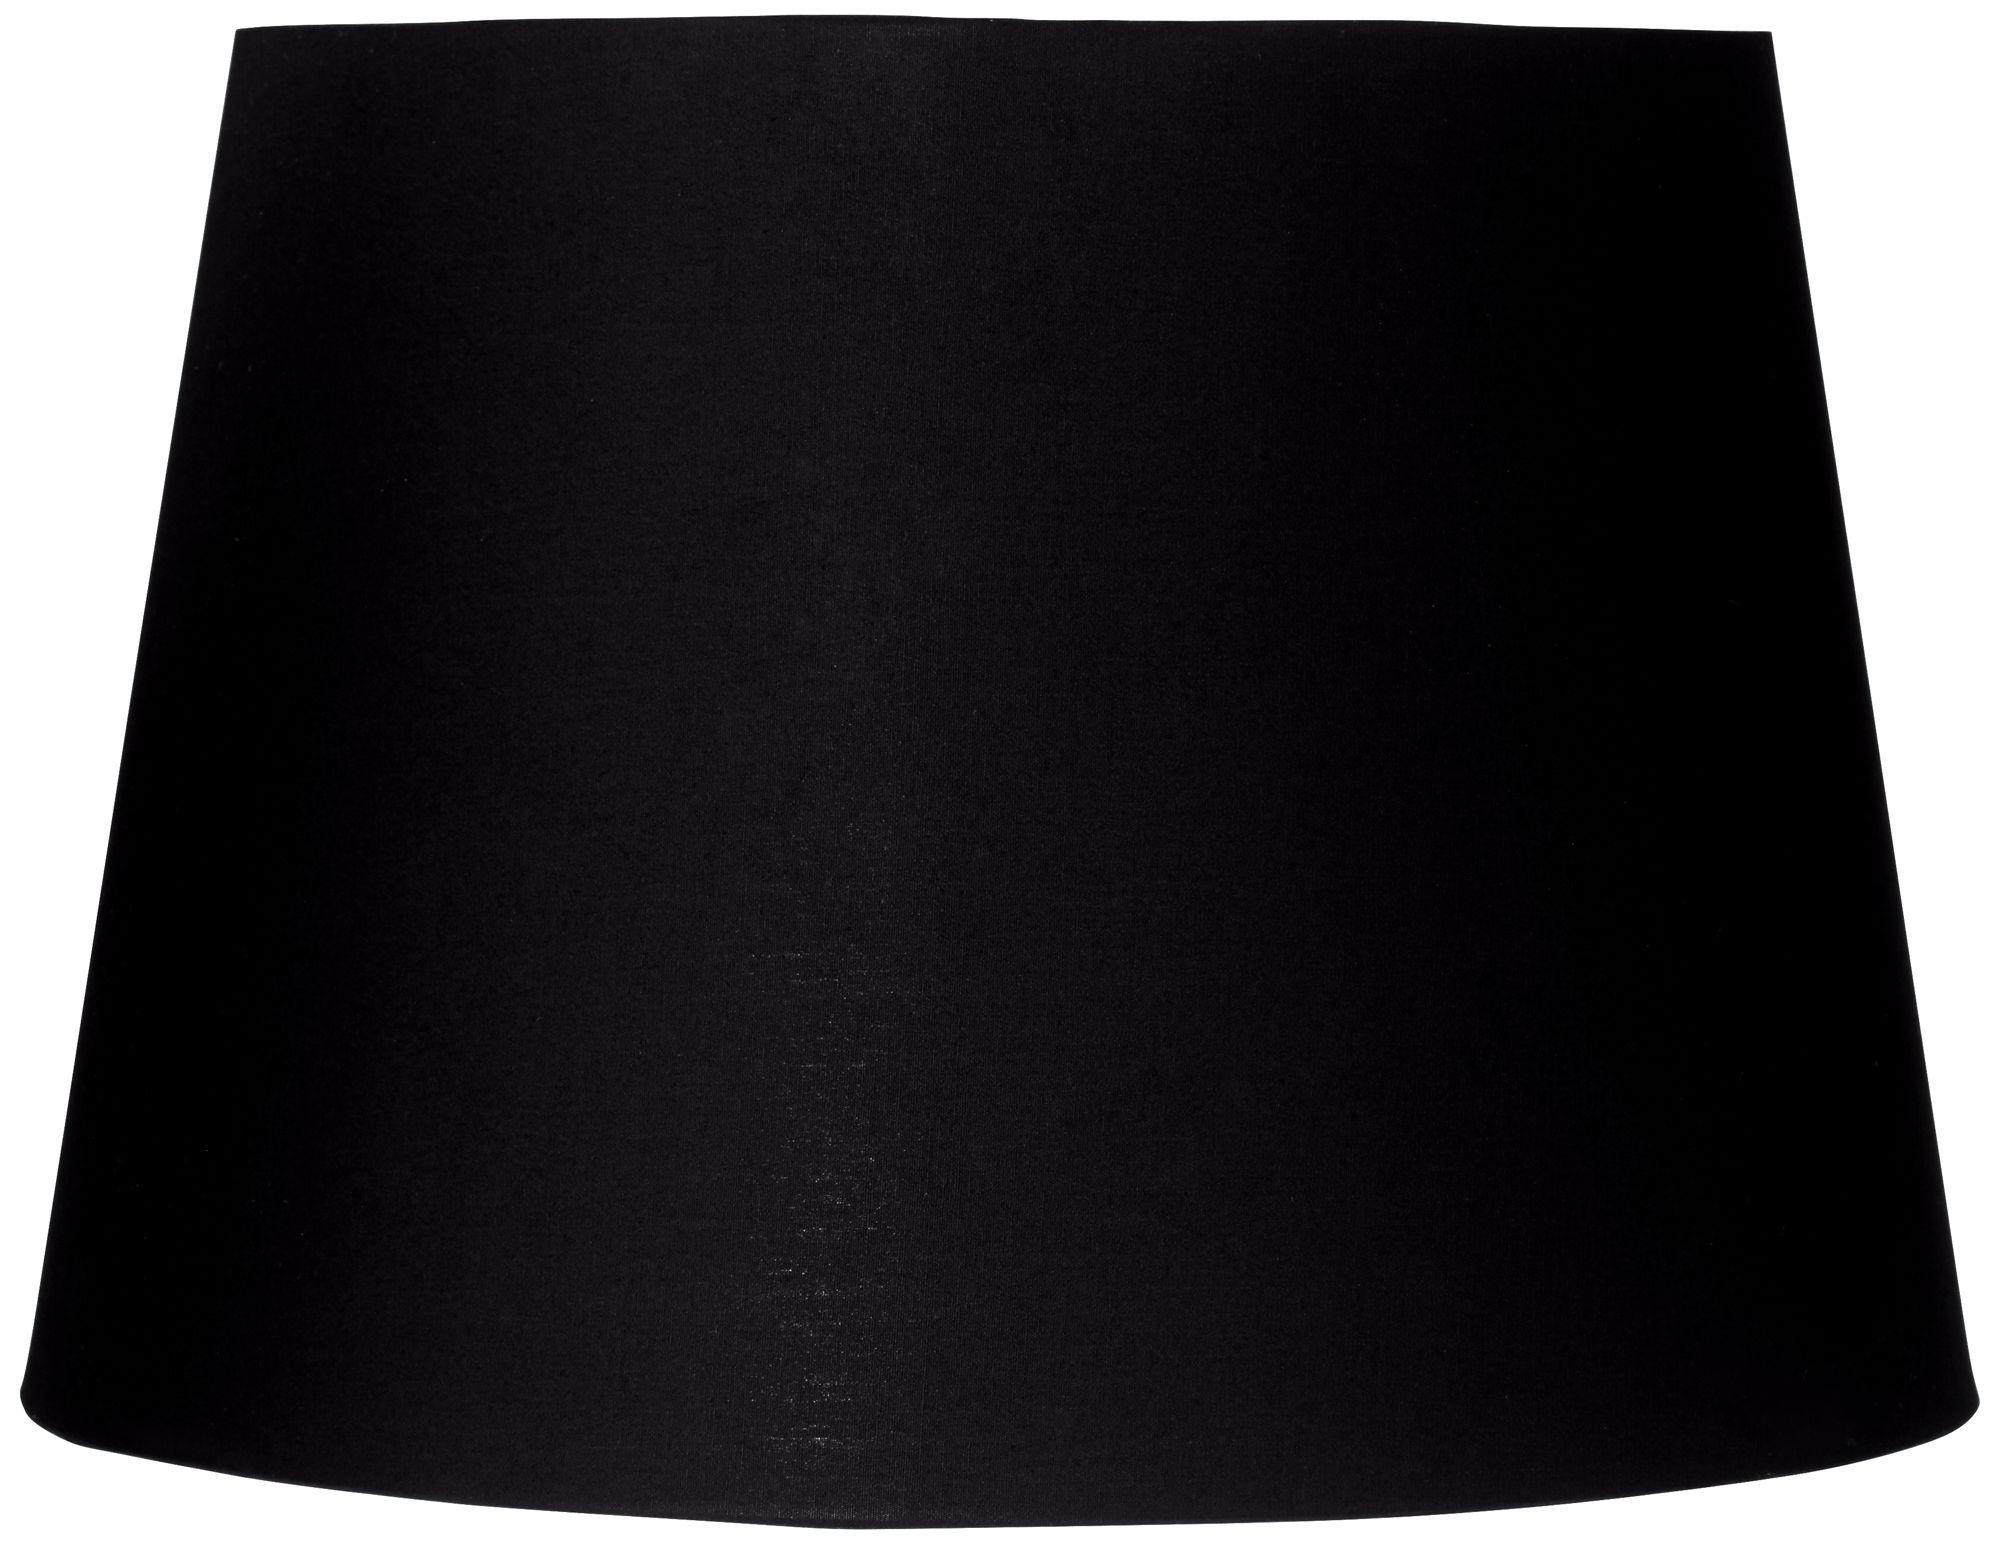 Superb Black And Antique Gold Drum Lamp Shade 11x12x10 (Spider)